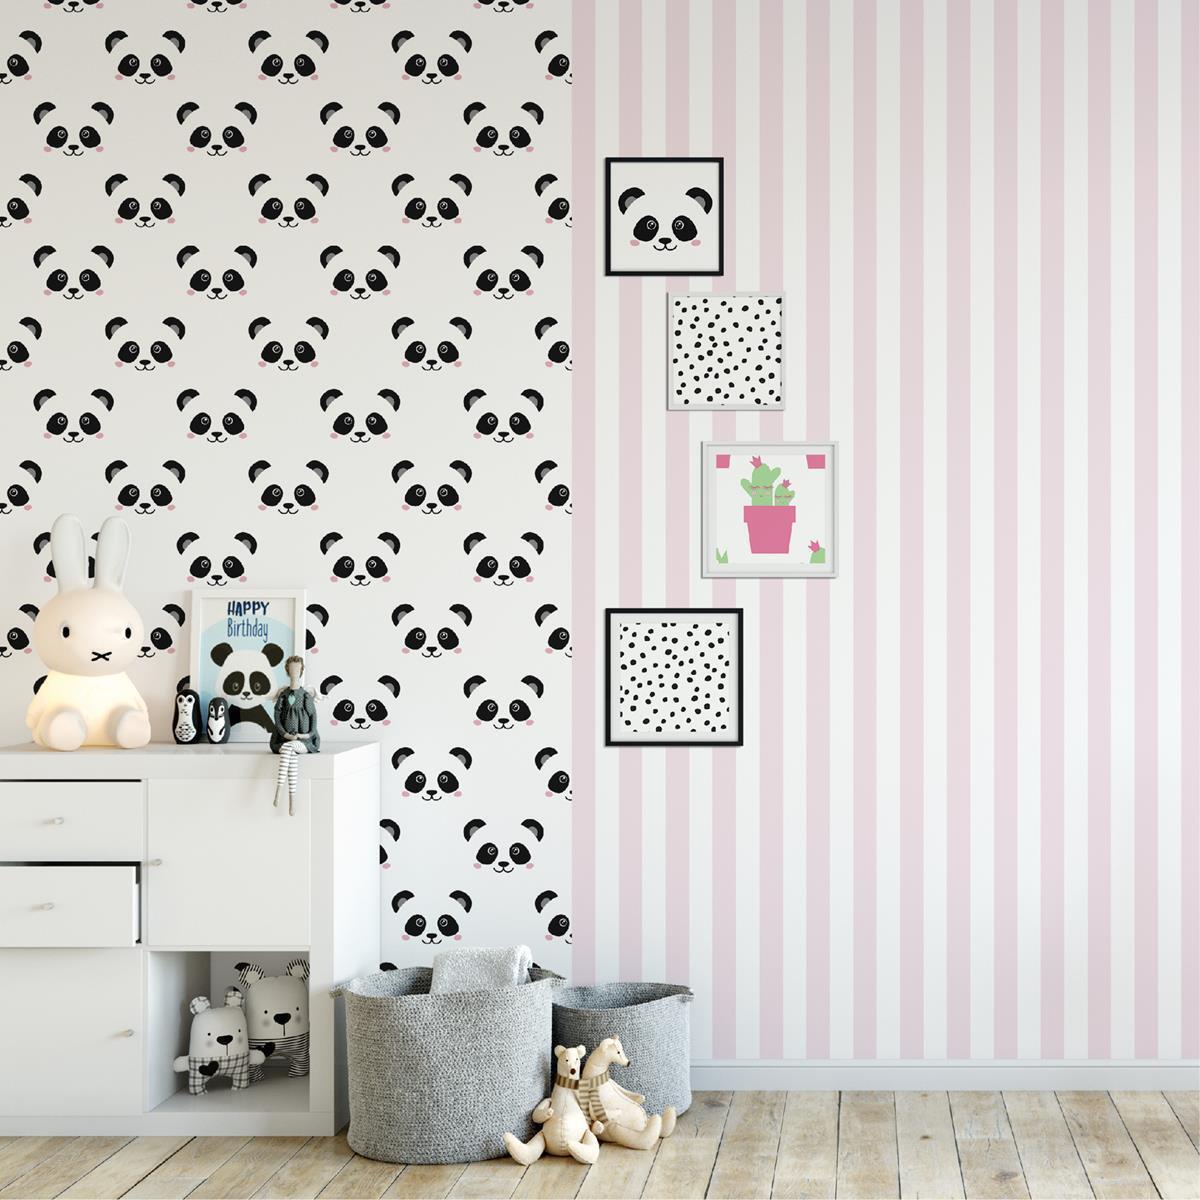 Vliestapete Streifen Rosa Weiß Schmal Fabulous World Tapete 67103 4/ EUR  3,56